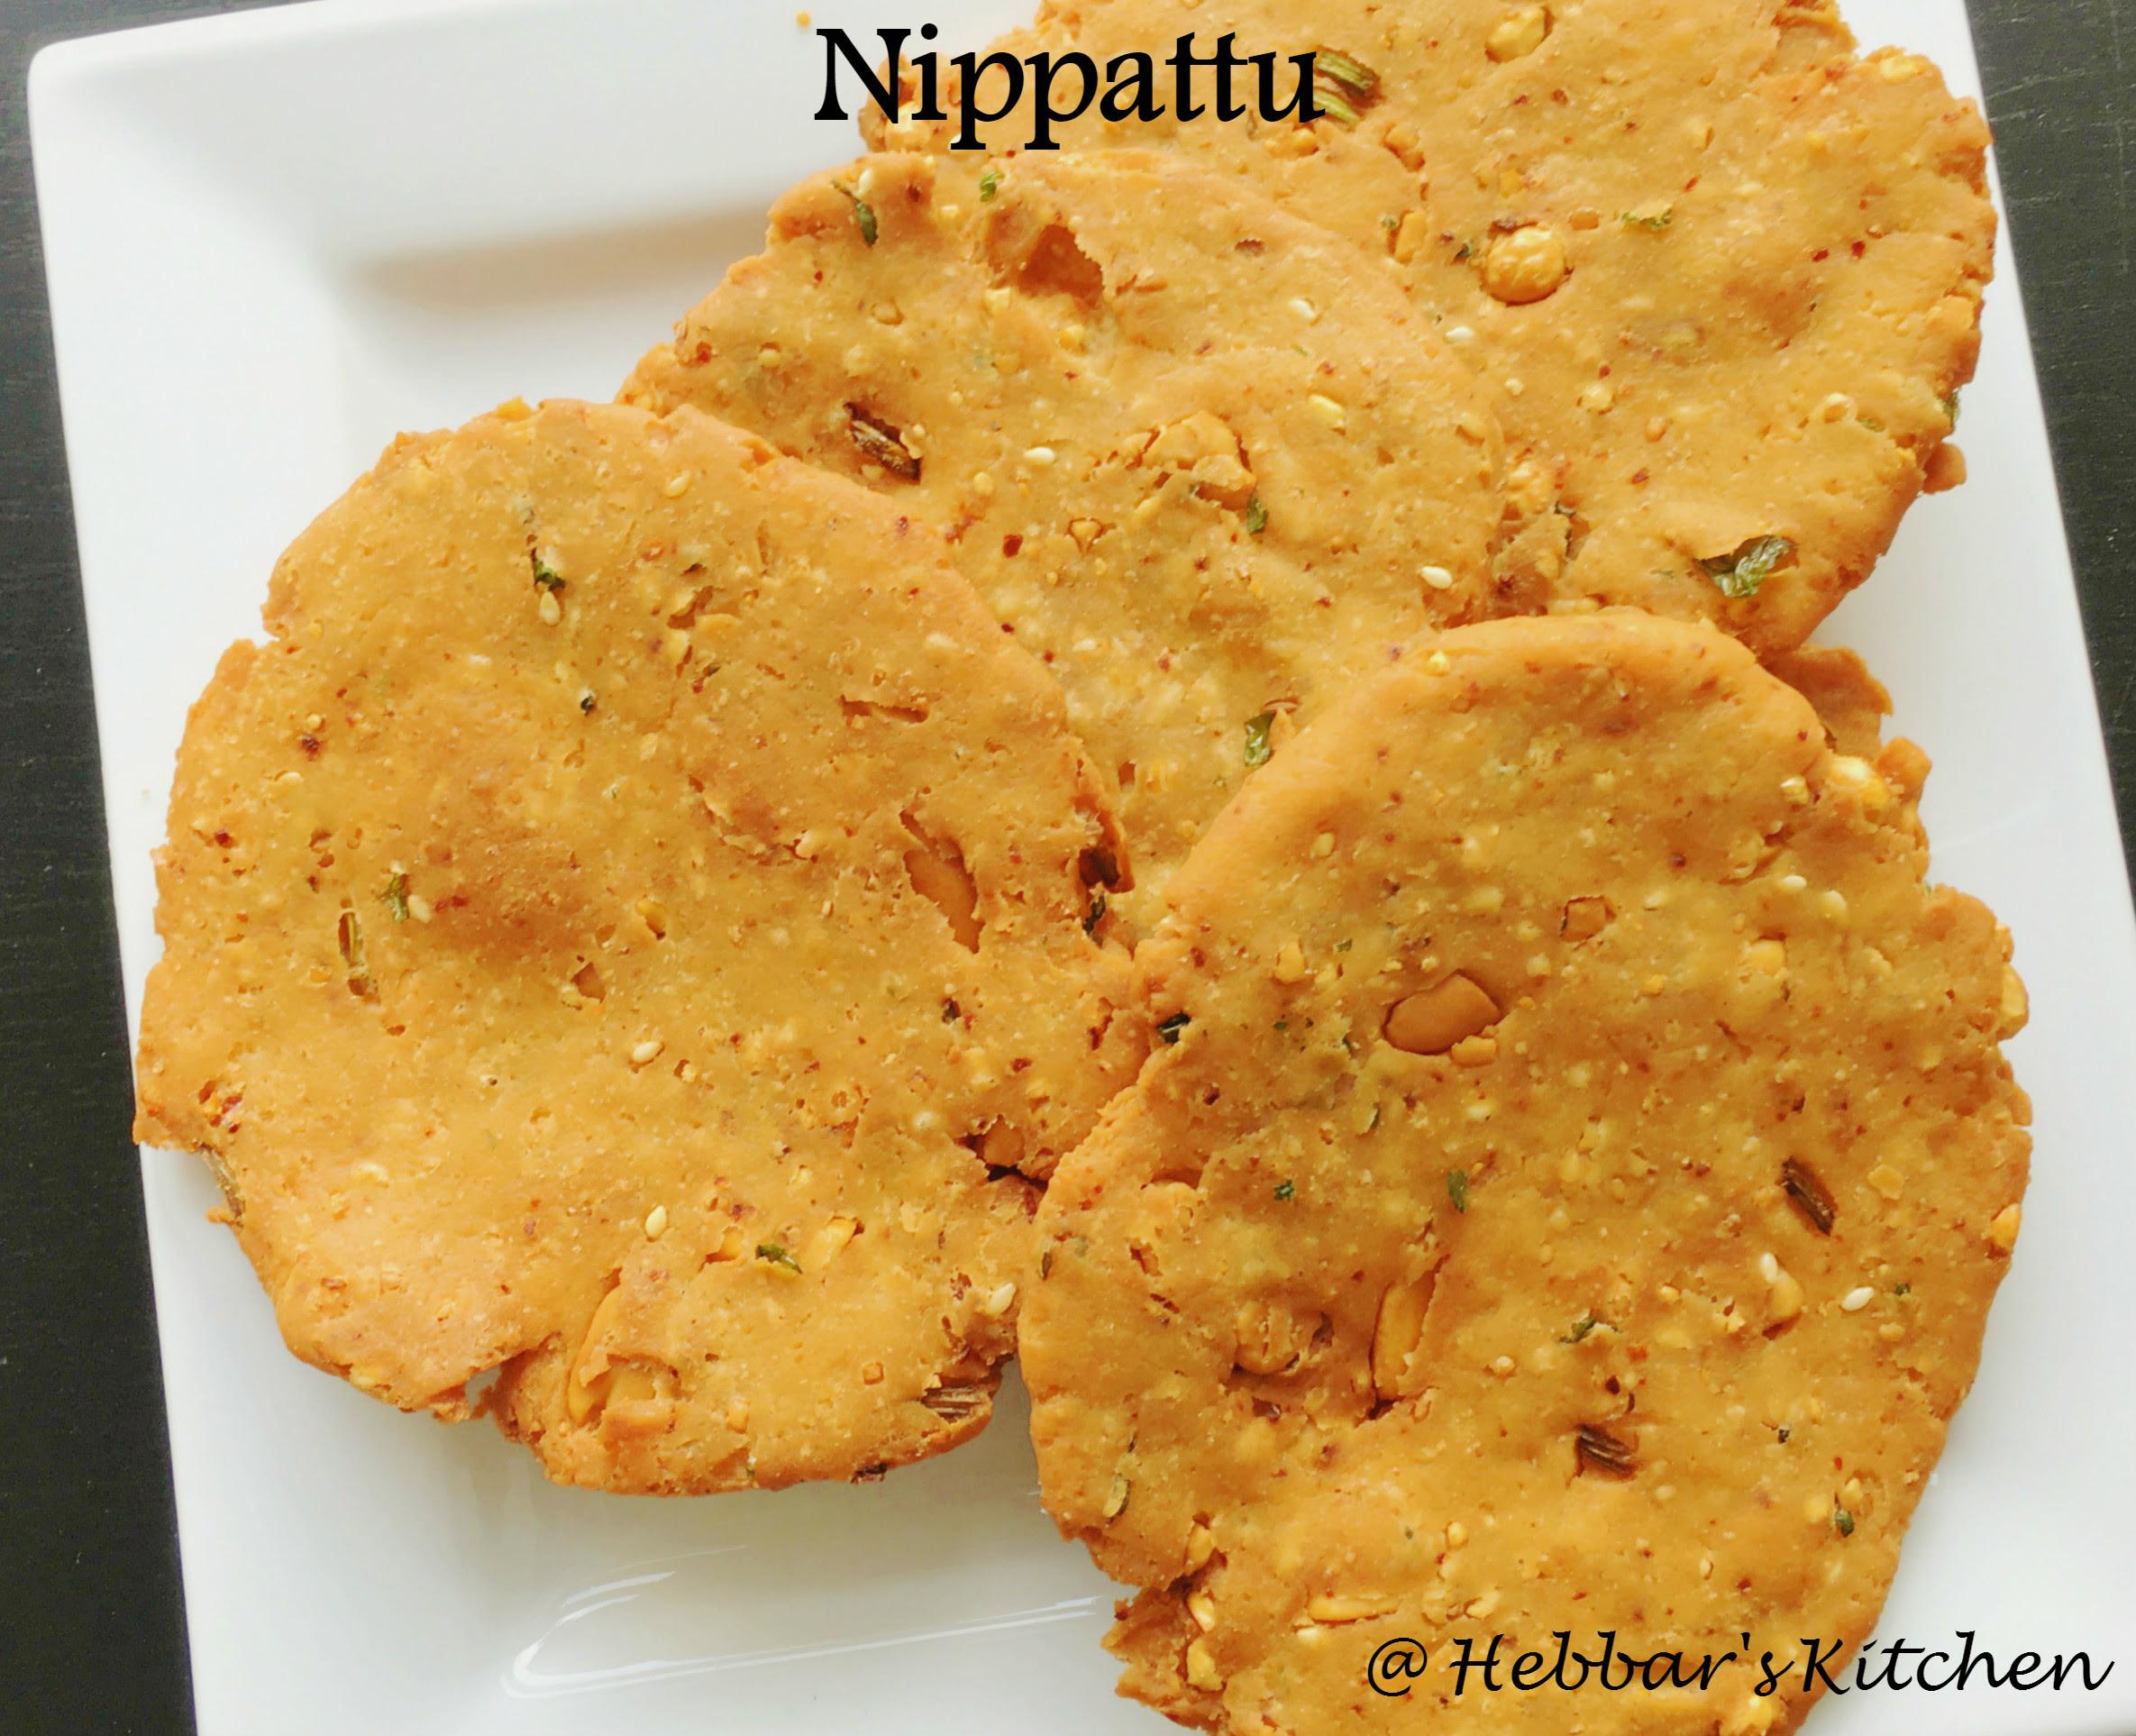 goli baje recipe / mangalore bajji recipe - Hebbar's Kitchen